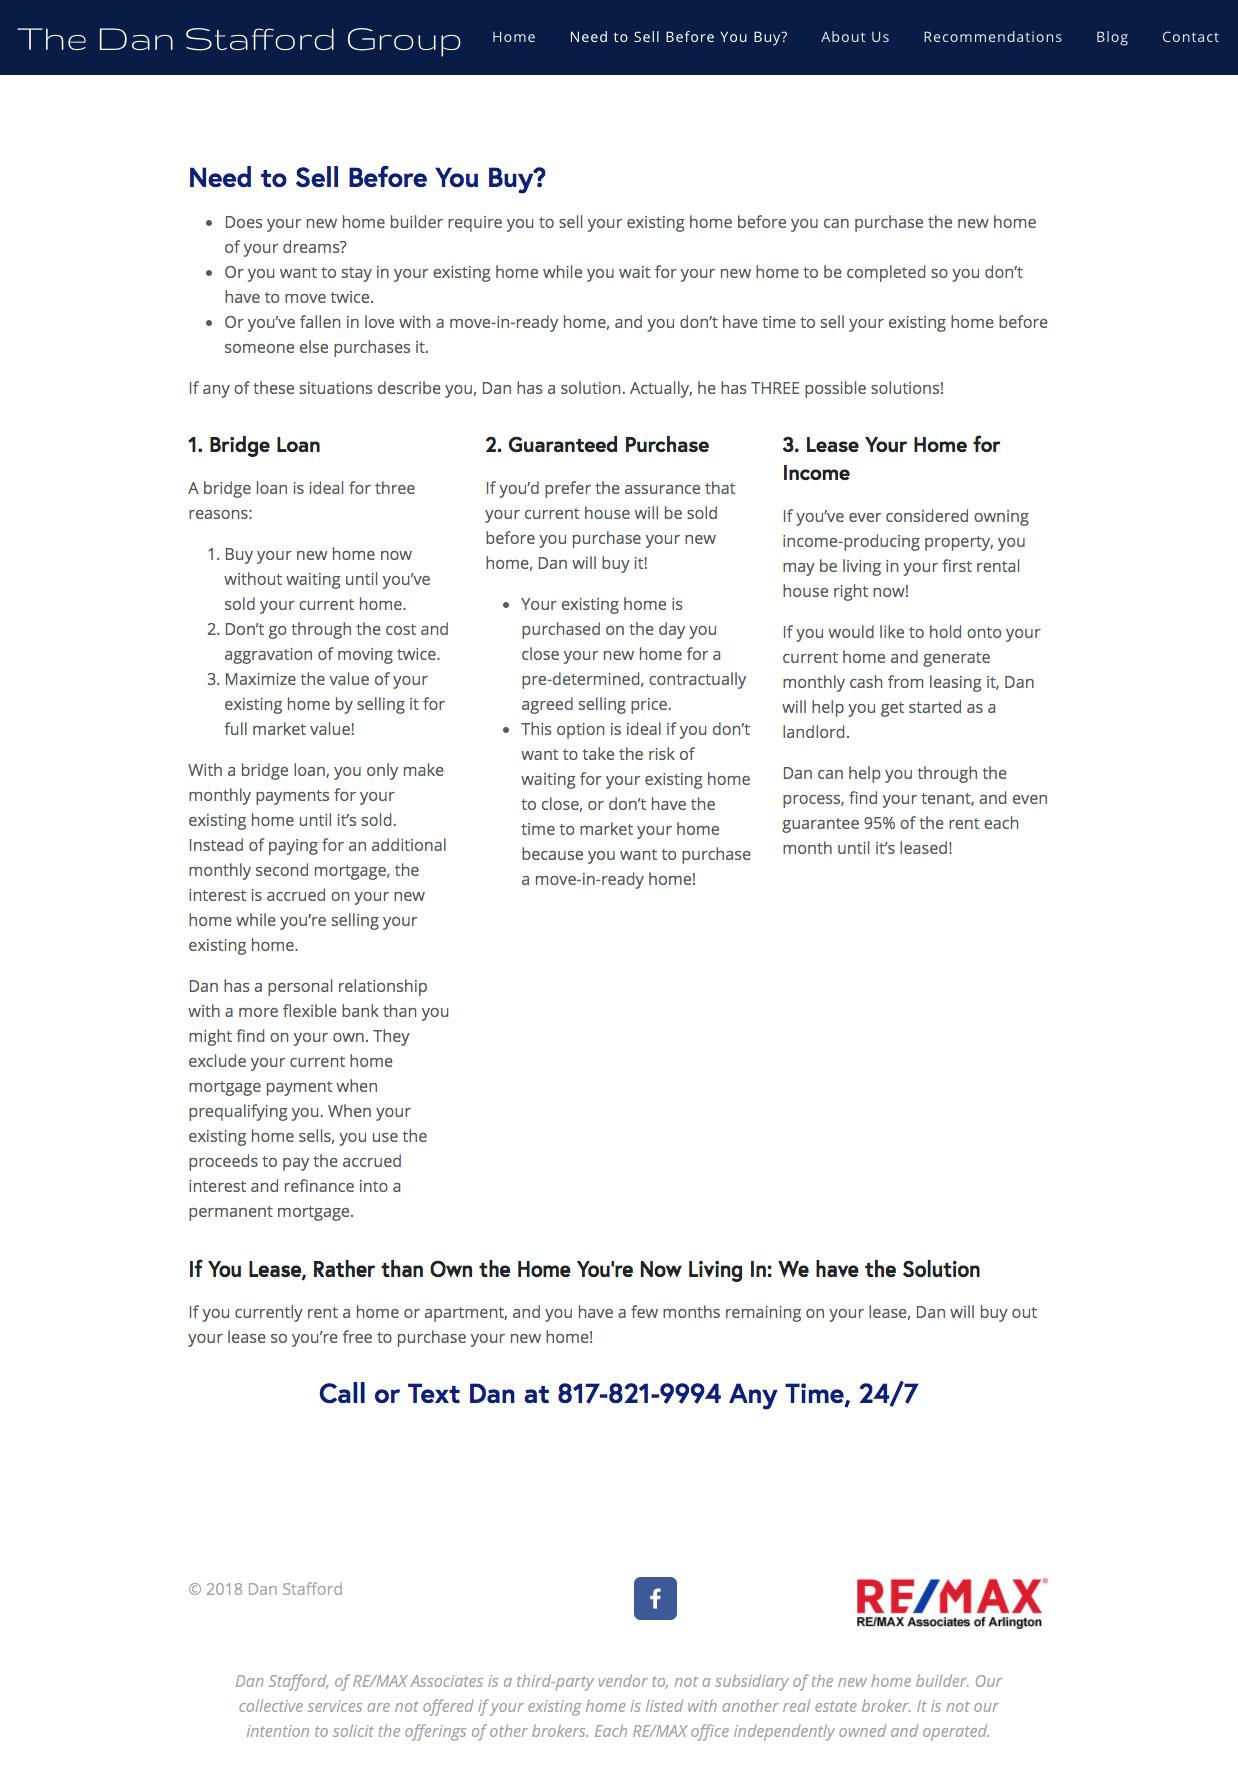 Dan-Stafford-Group-Web-Page-2.jpg